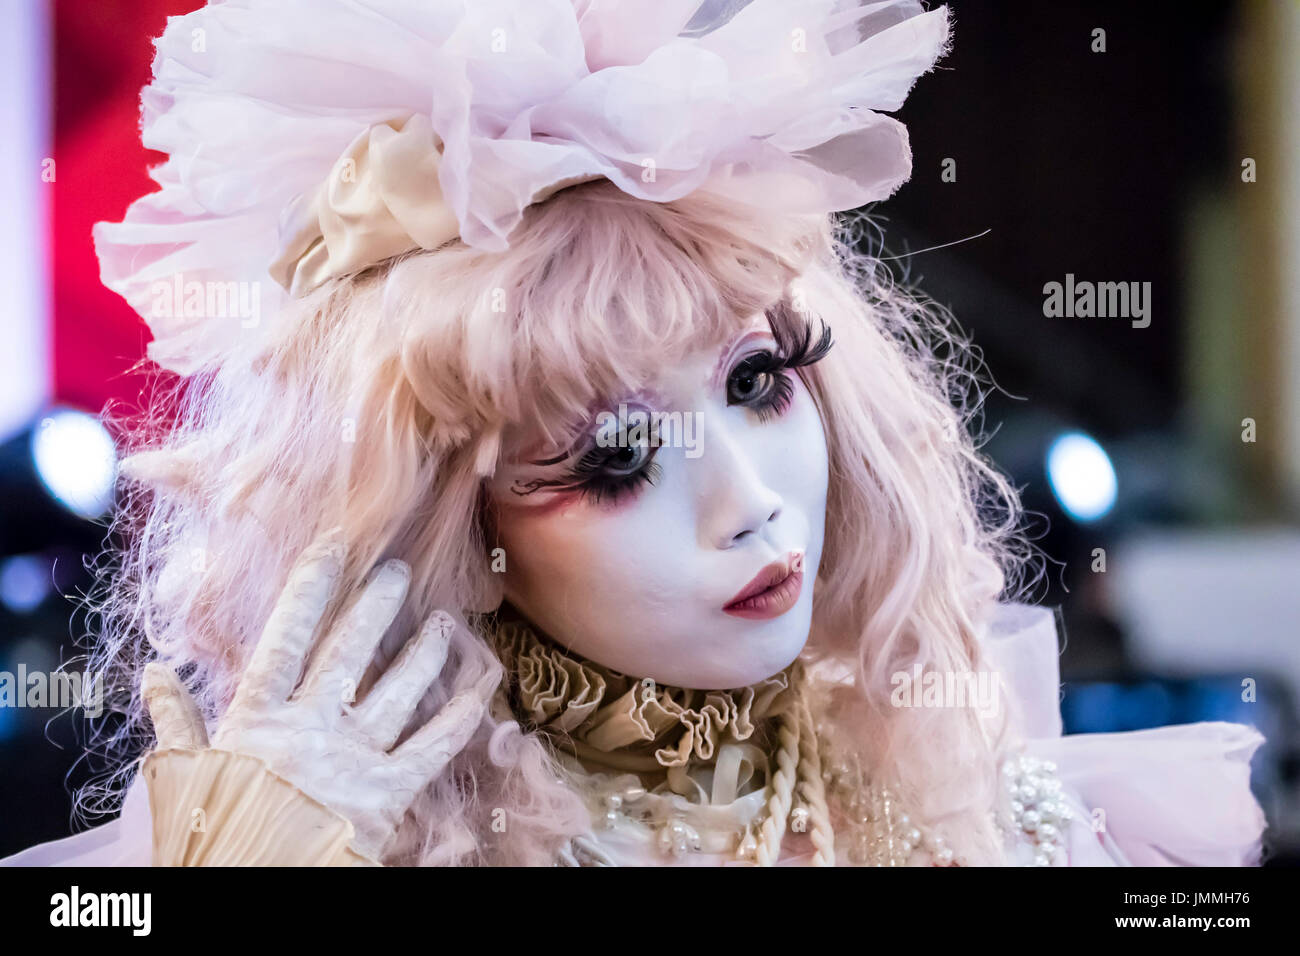 "Kuala Lumpur, Malaysia. 28th July, 2017. This is Japan's famous Minori, a Japanese shiro-nuri artist. ""Shiro-nuri"" Stock Photo"